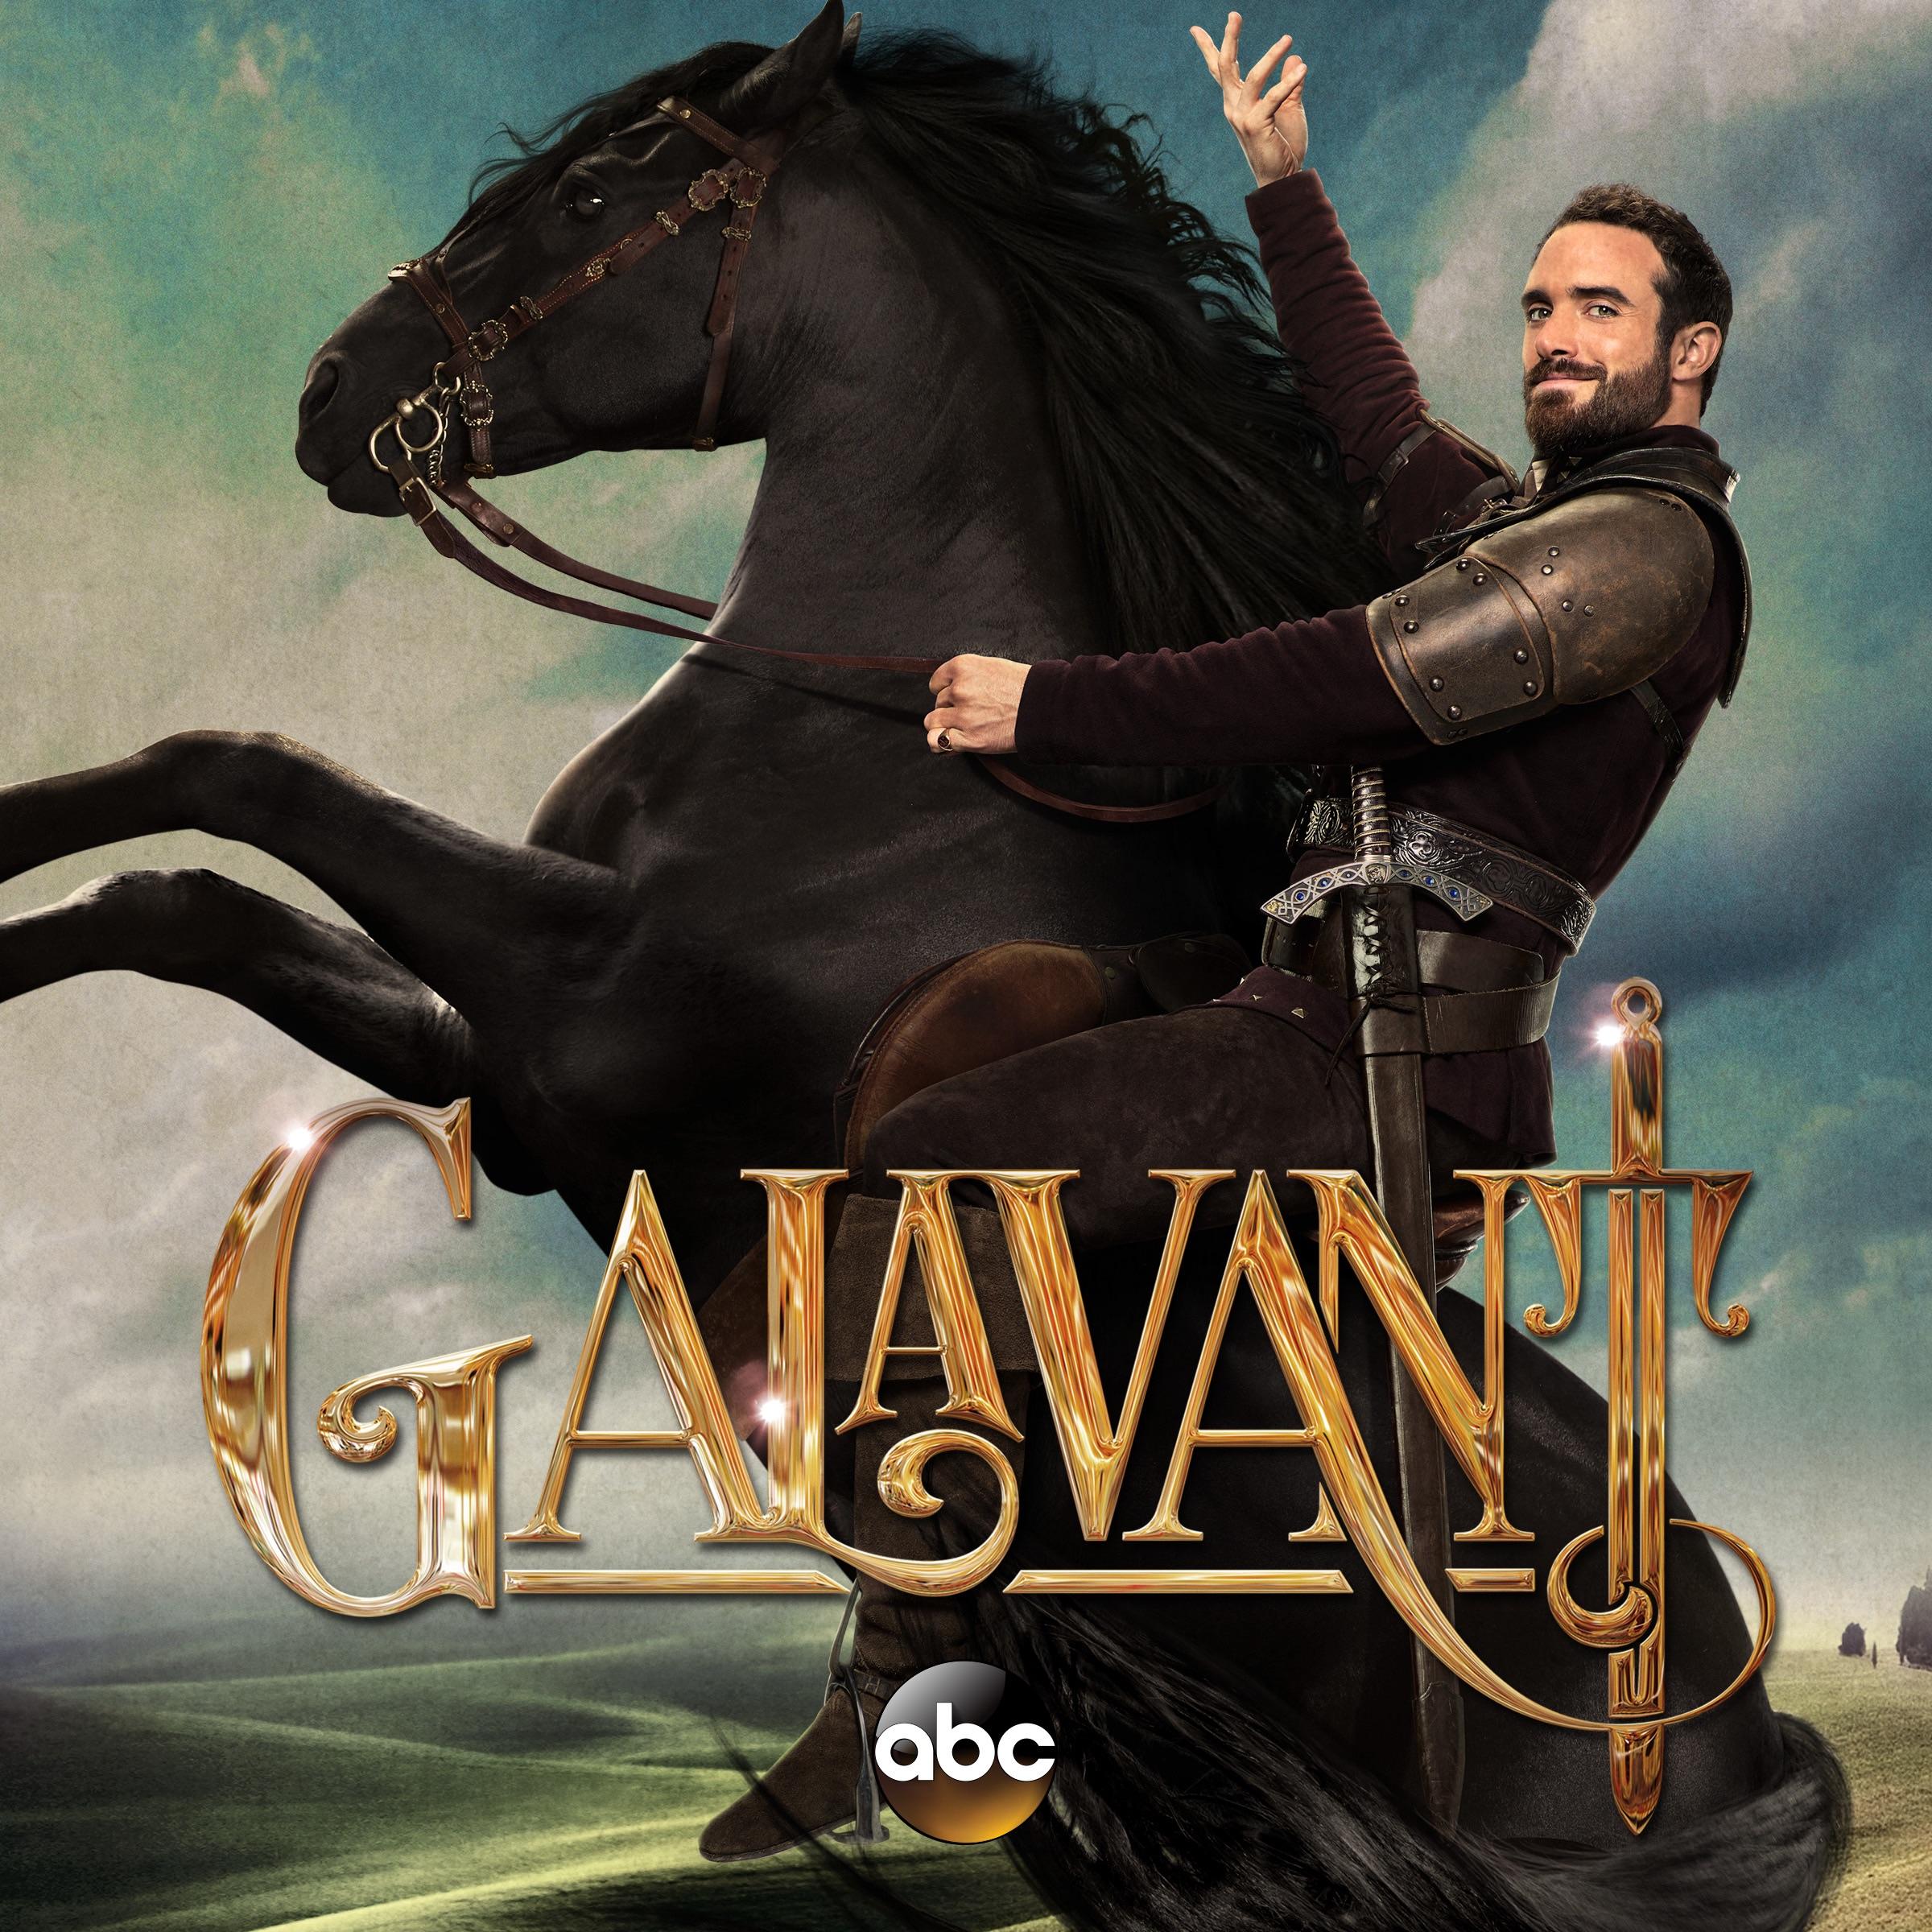 2400x2400sr Jpg: Galavant, Season 1 On ITunes